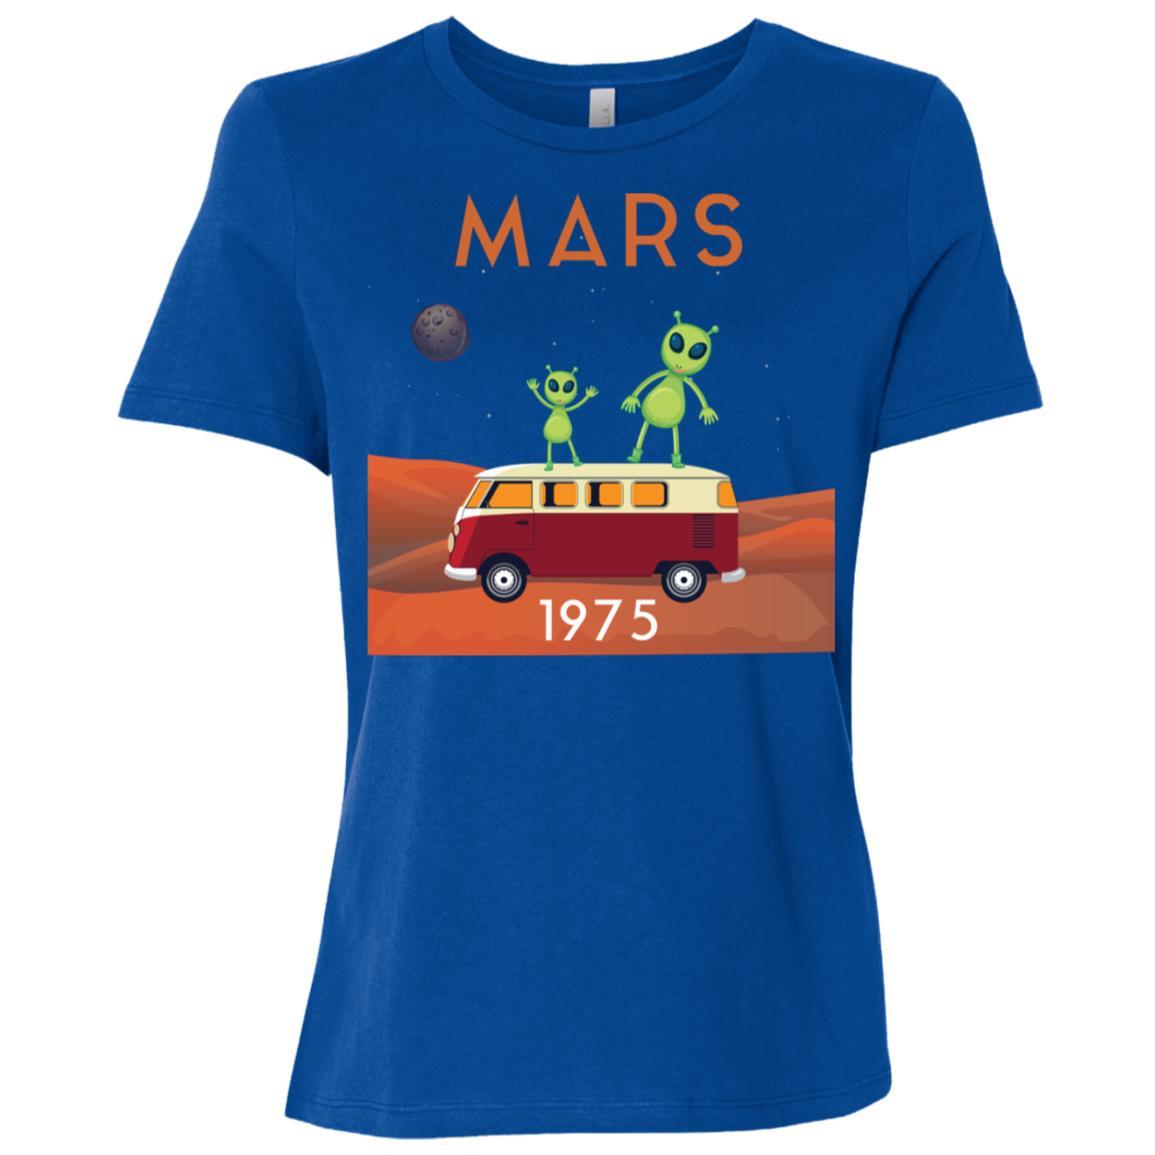 Mars 1975 Funny Alien Outer Space Gift Women Short Sleeve T-Shirt